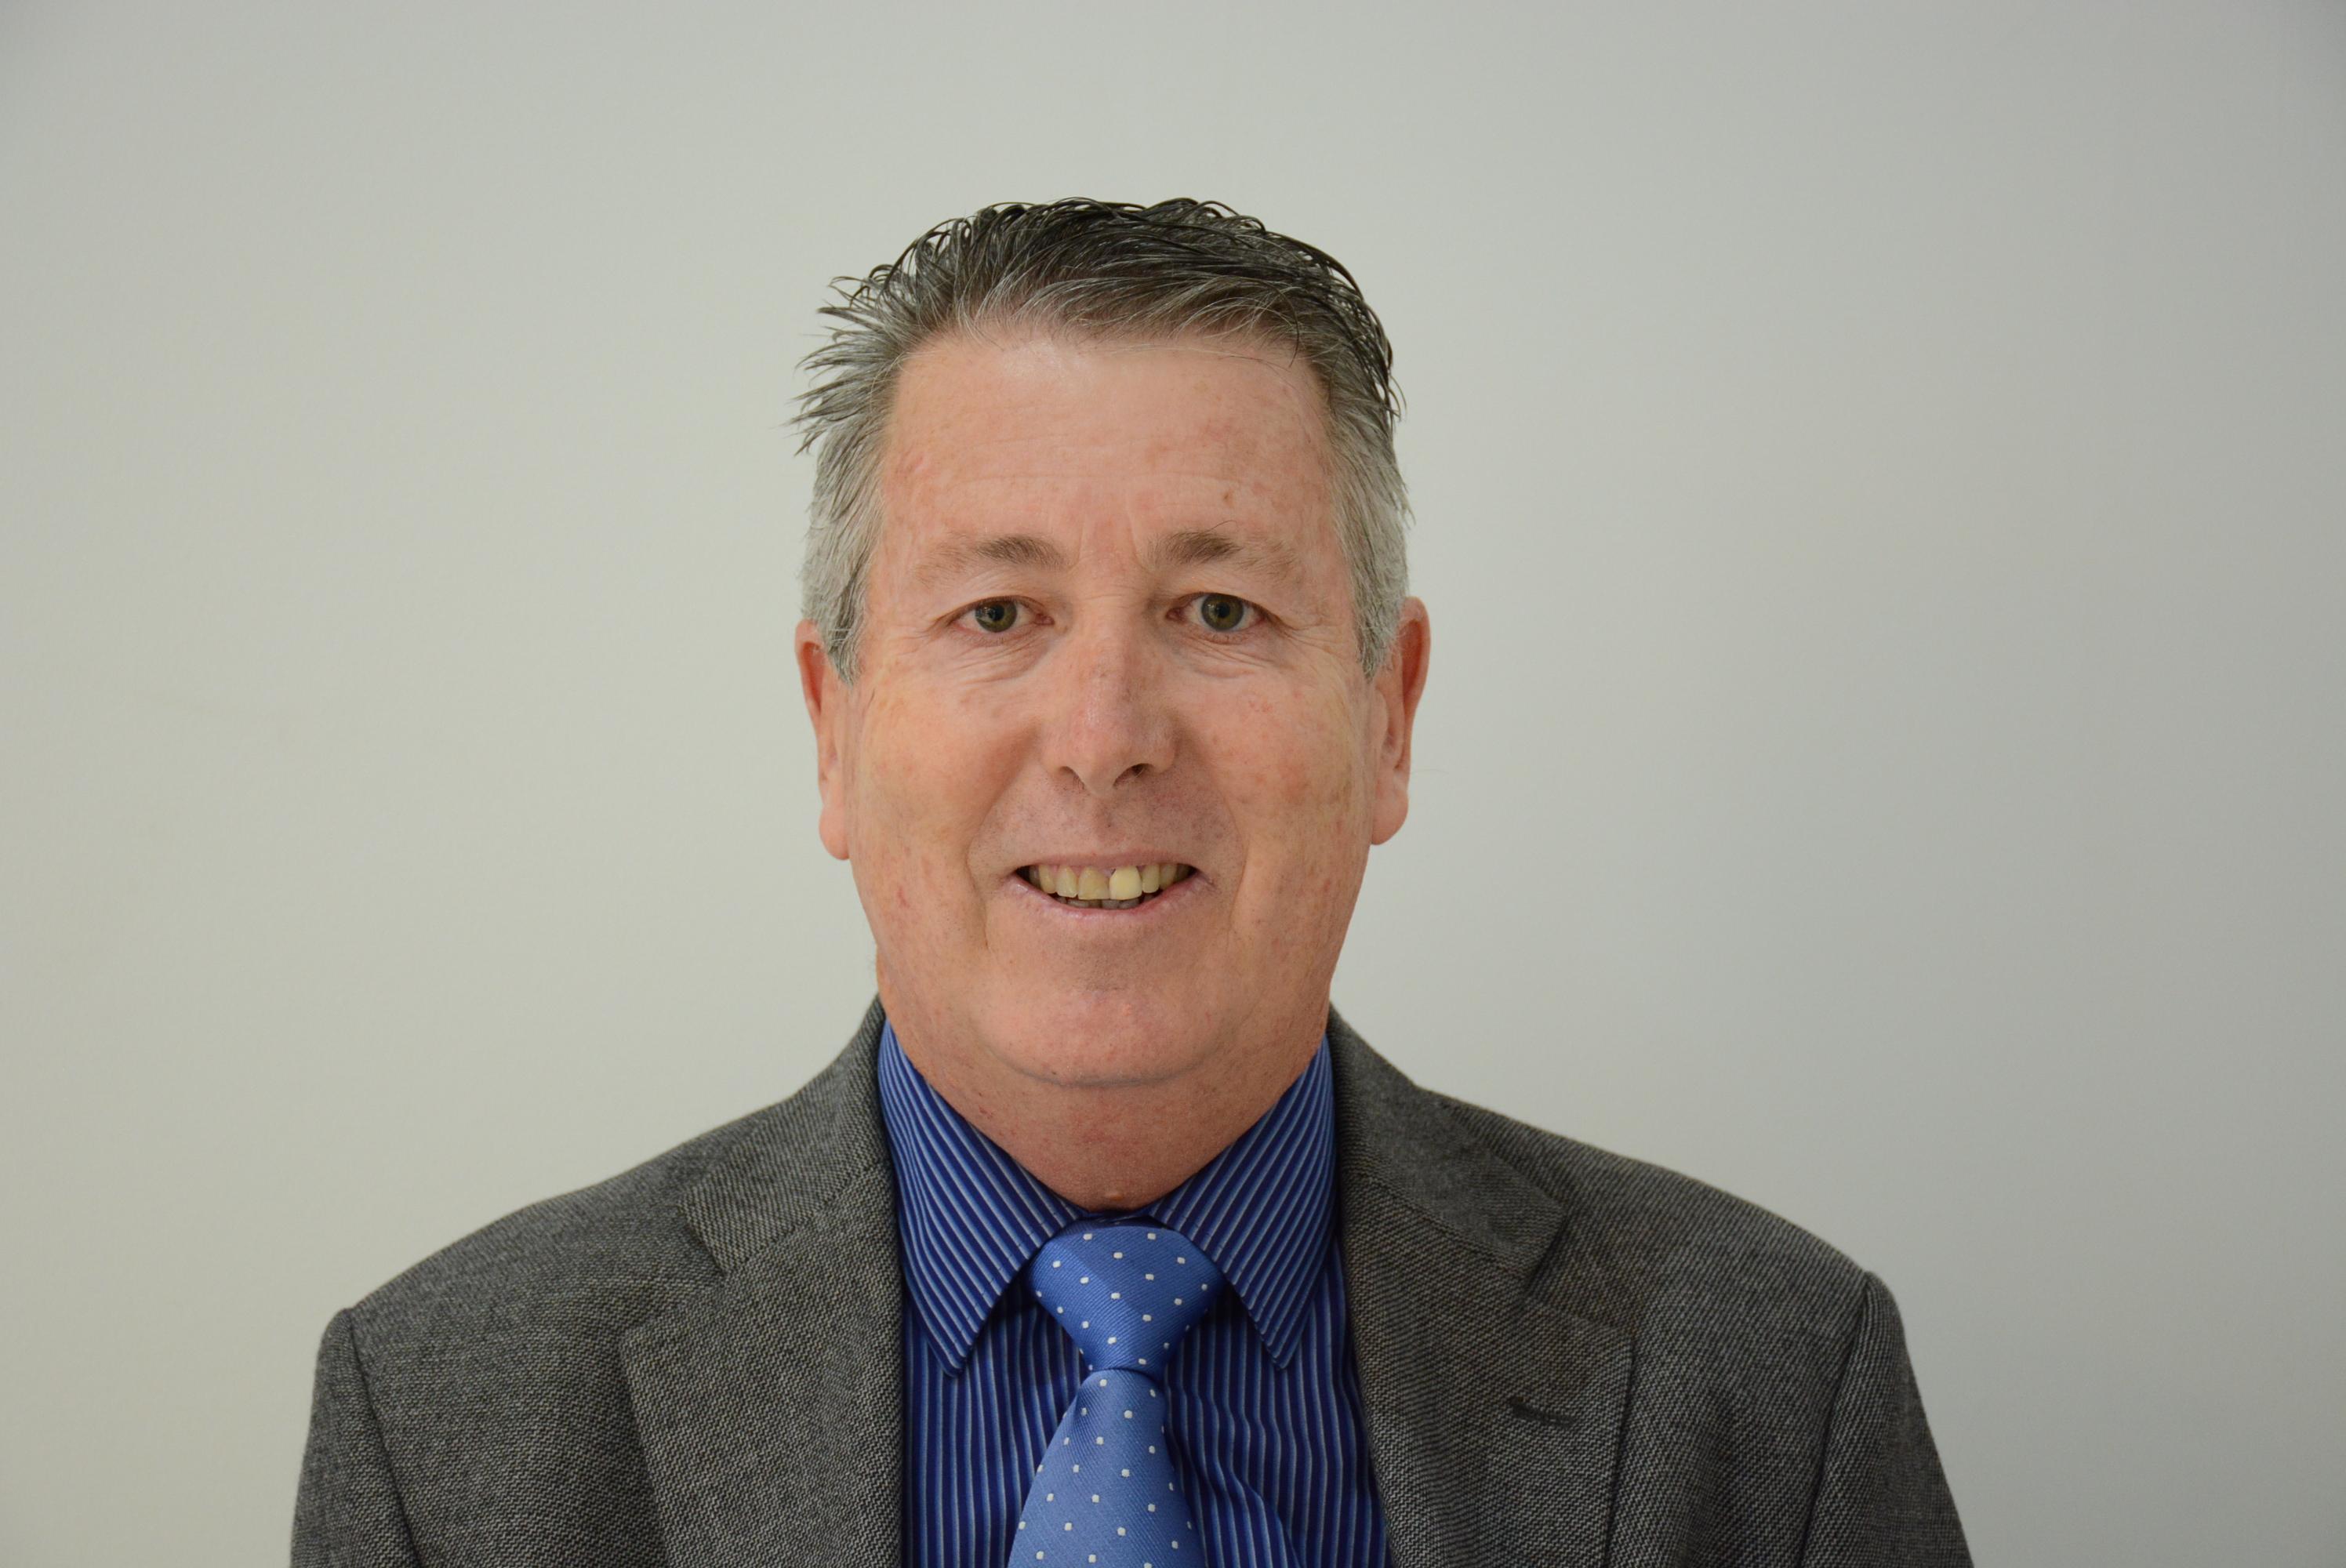 Steve Bergh